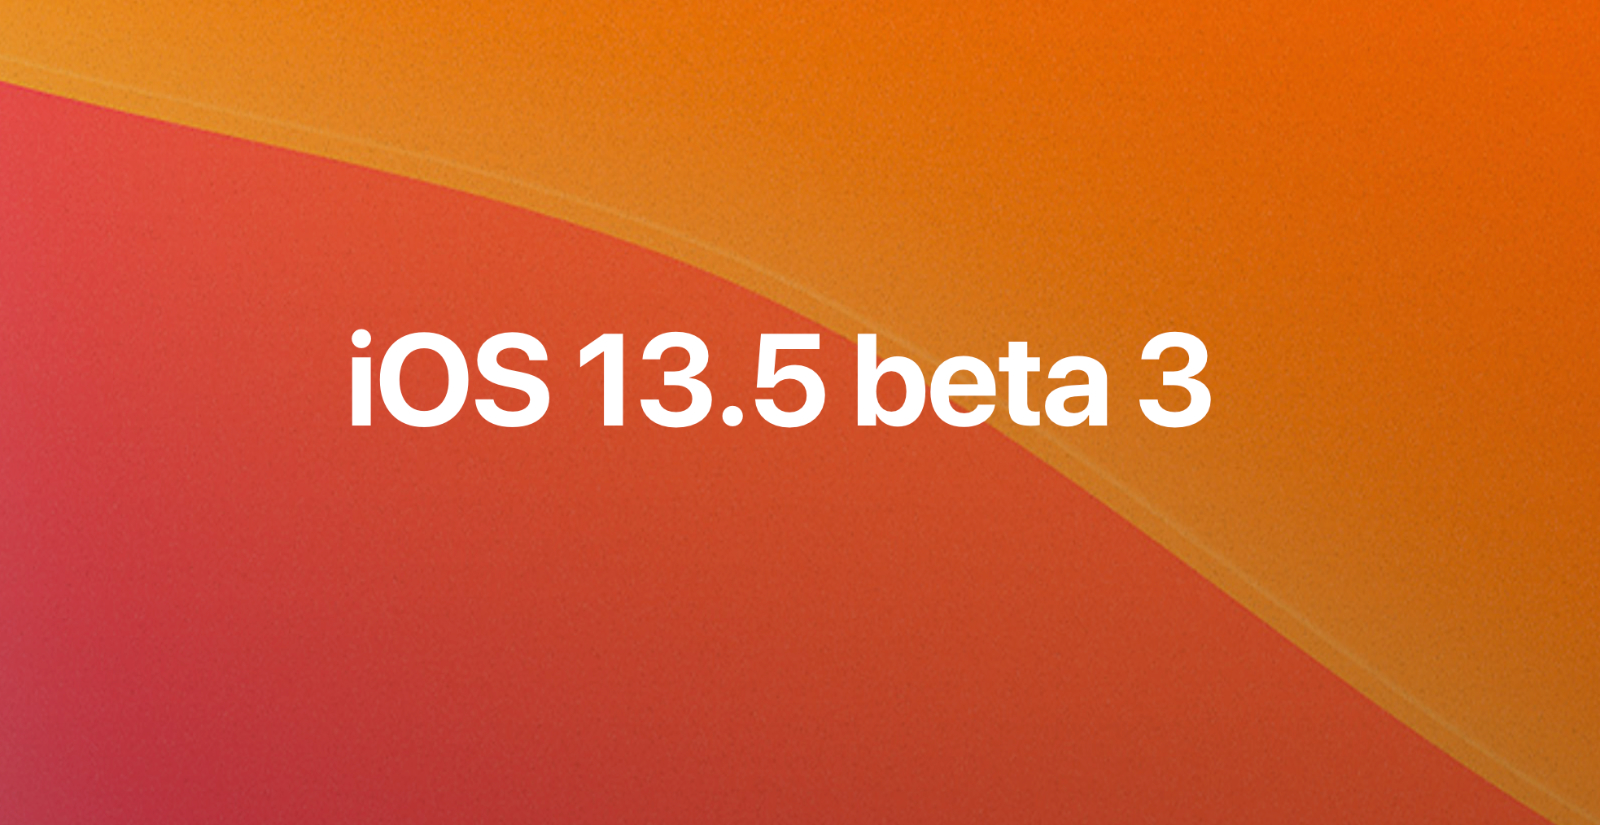 iOS 13.5 beta 3, iPadOS 13.5 beta 3, watchOS 6.2.5 beta 3 y tvOS 13.4.5 beta 3